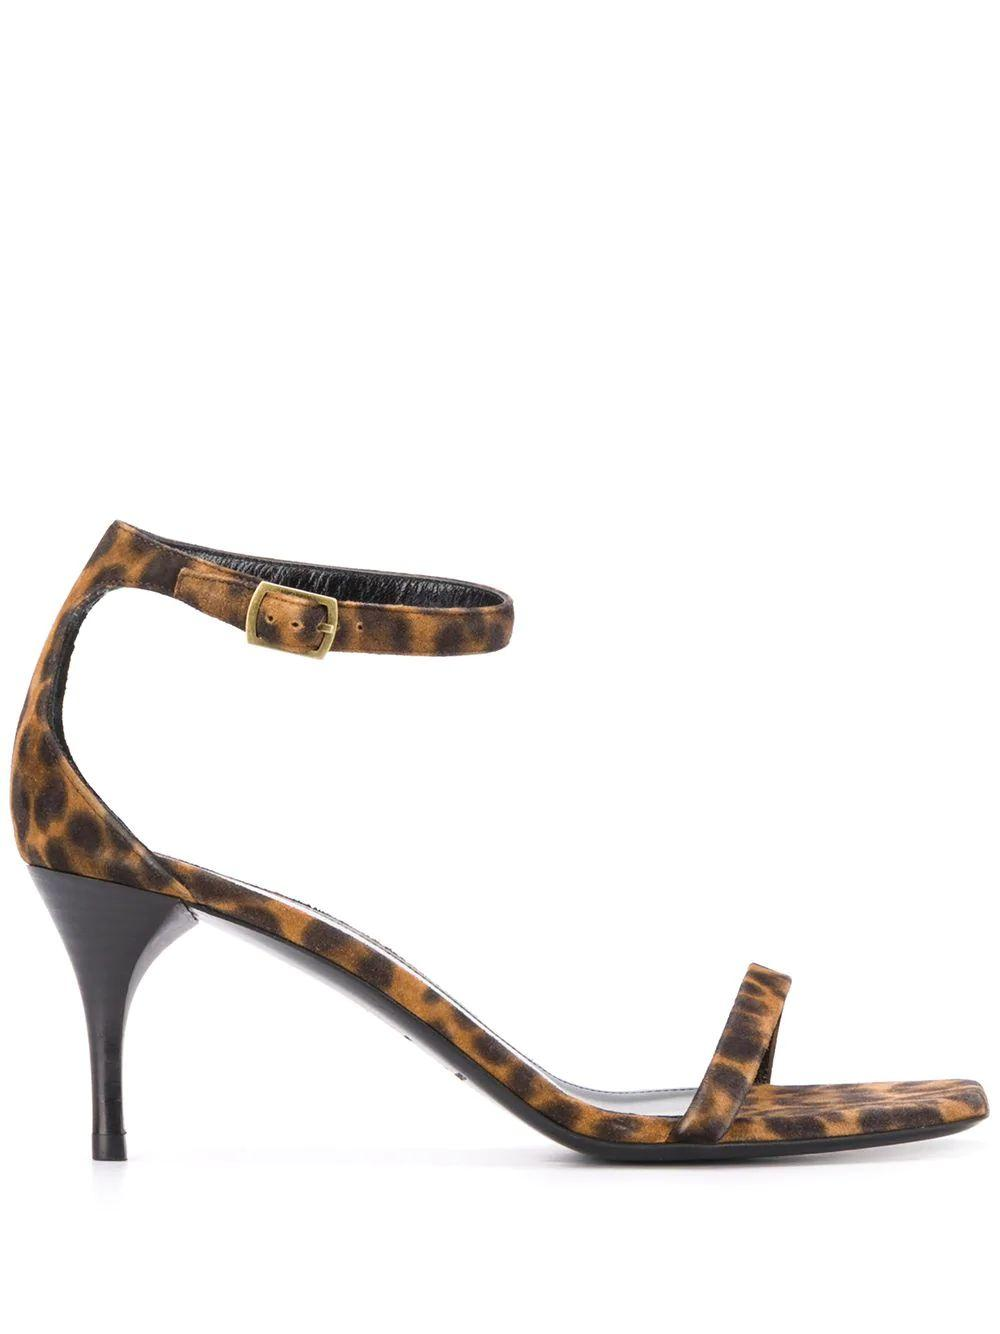 Lexi 65mm Leopard Print Sandal Item # 6324031FL00